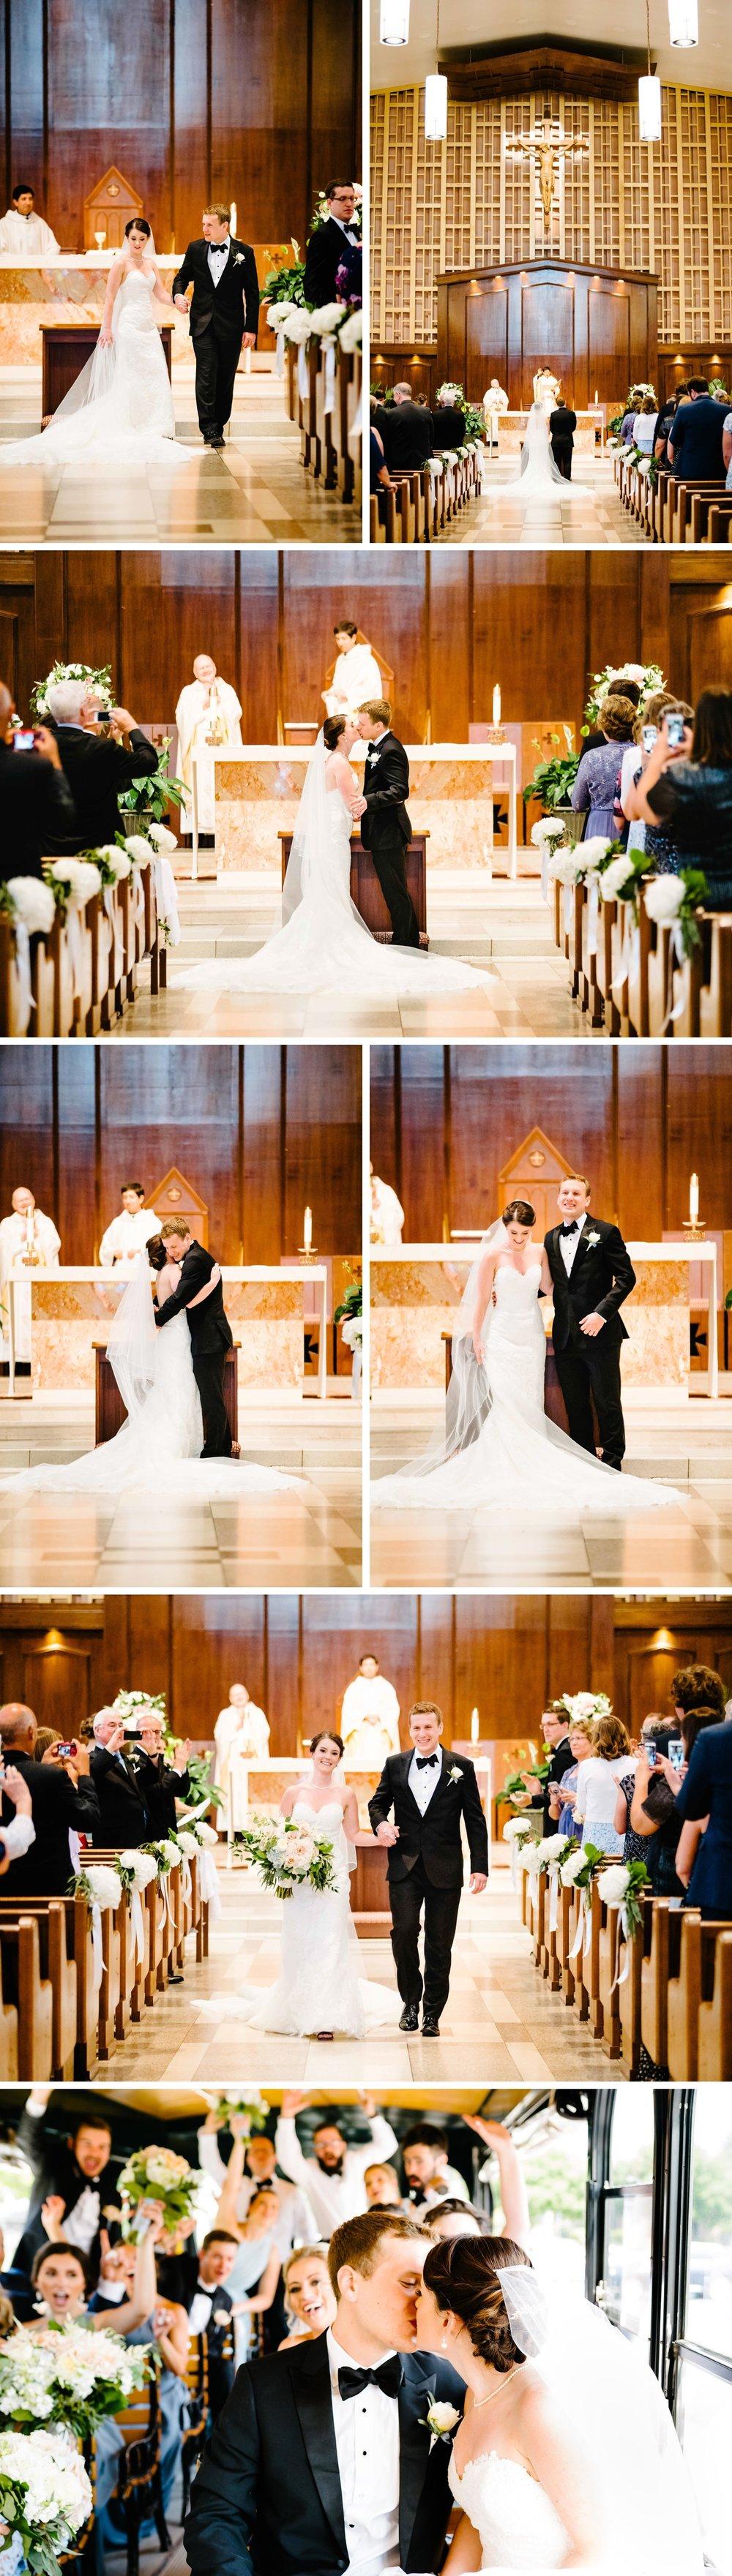 chicago-fine-art-wedding-photography-kinn31